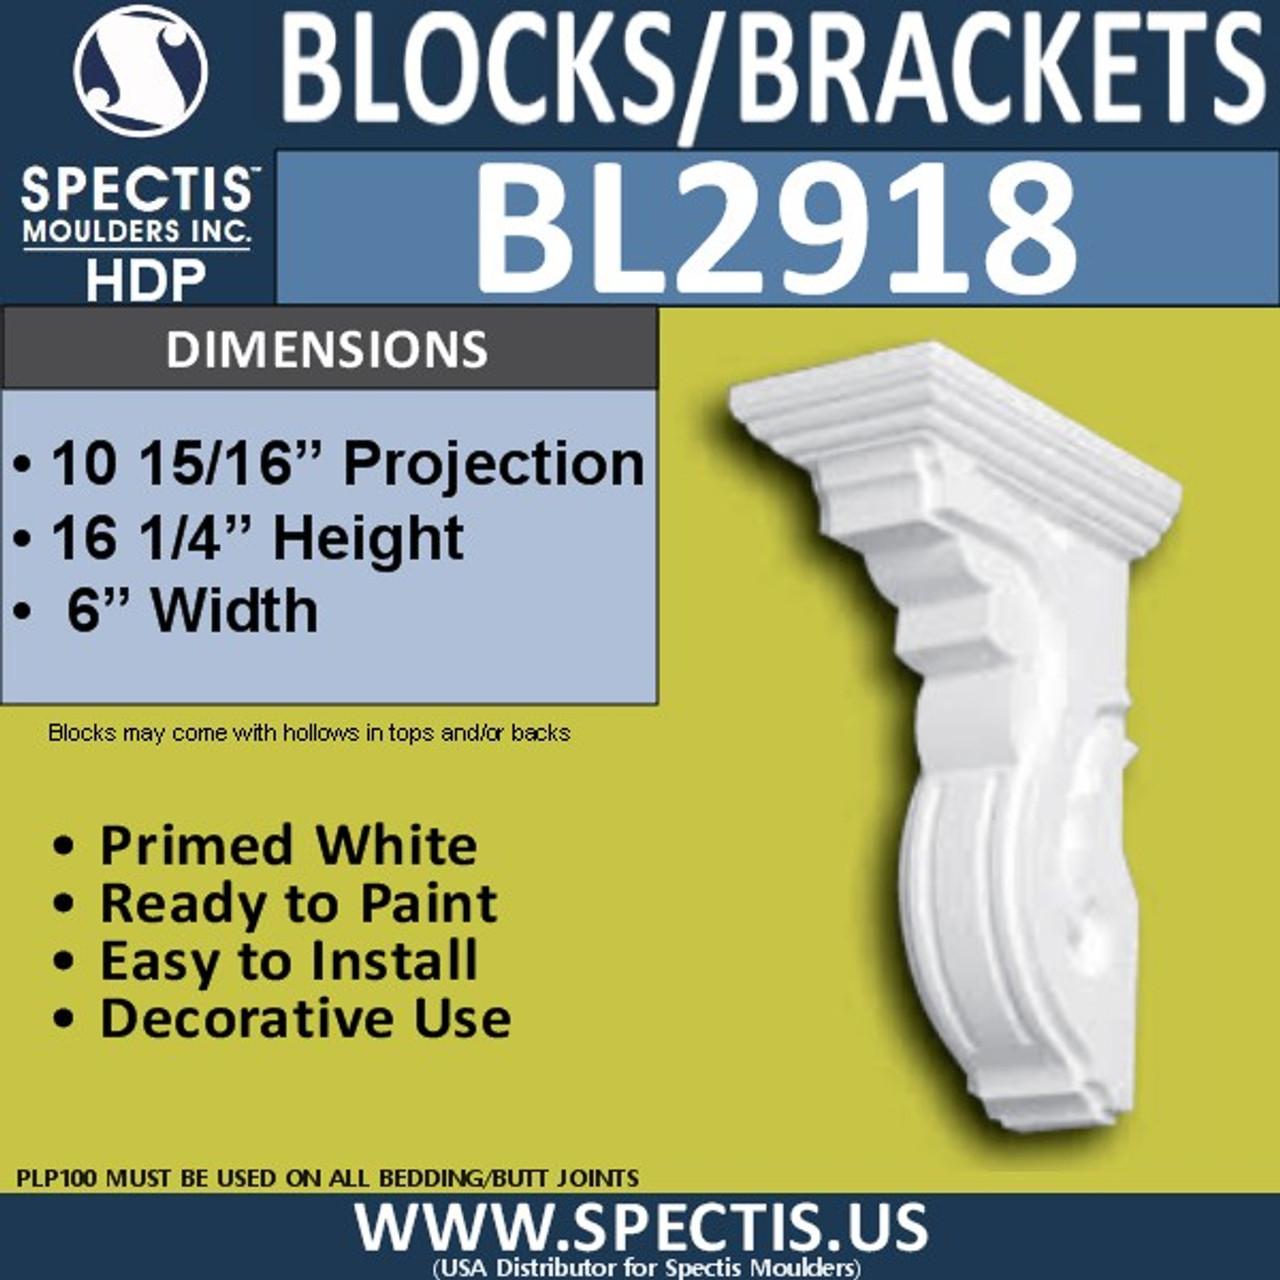 "BL2918 Eave Block or Bracket 6""W x 16.25""H x 11"" P"